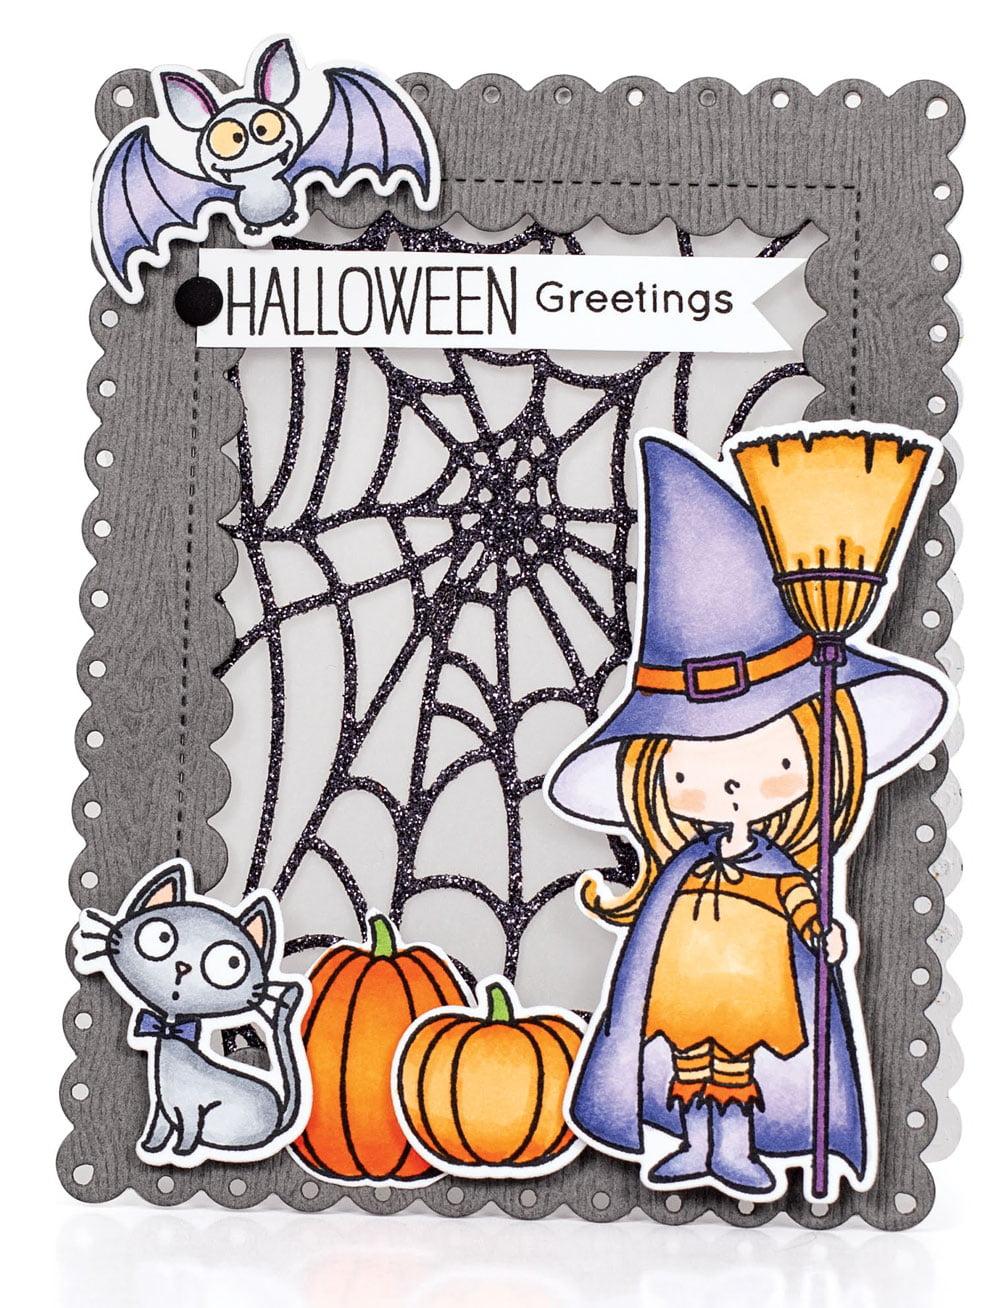 SCT Fall 2018 - Halloween Greetings by Latisha Yoast